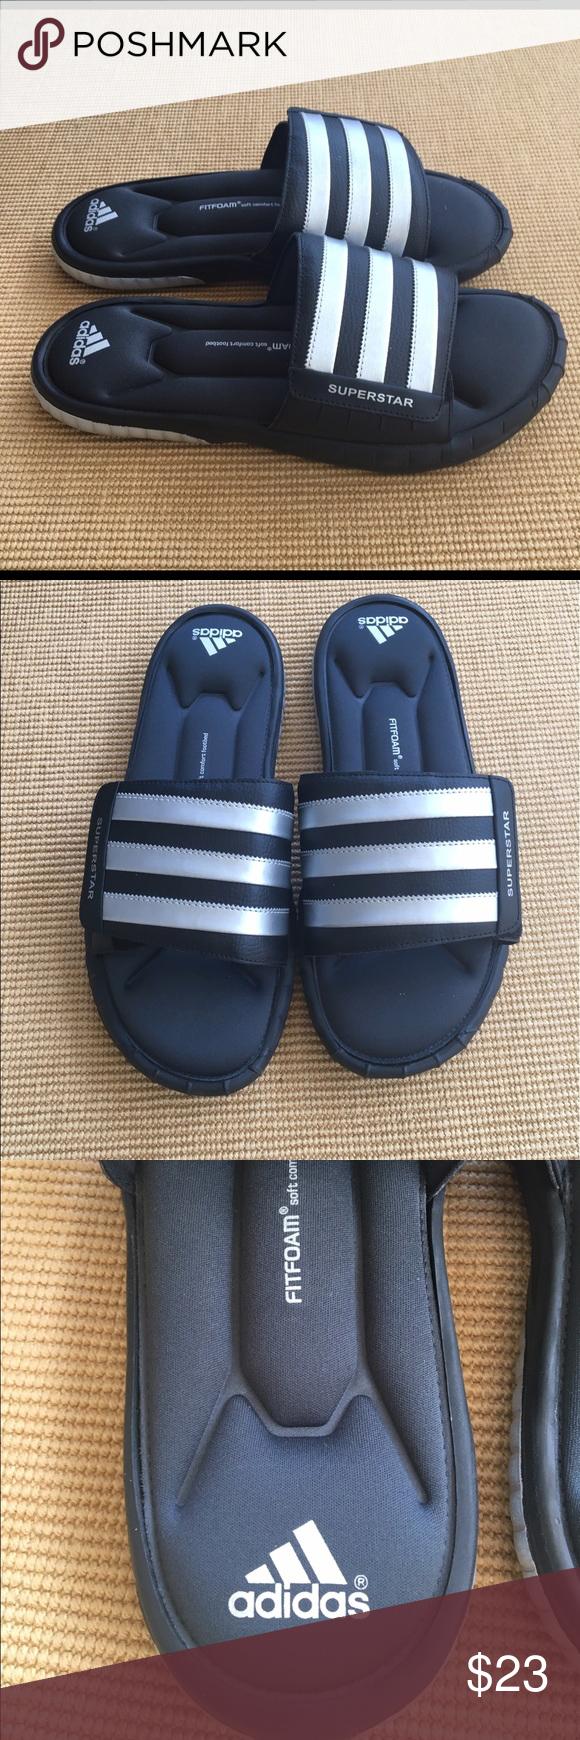 adidas superstar sandali cursori in forma schiuma nwob 12 adidas superstar